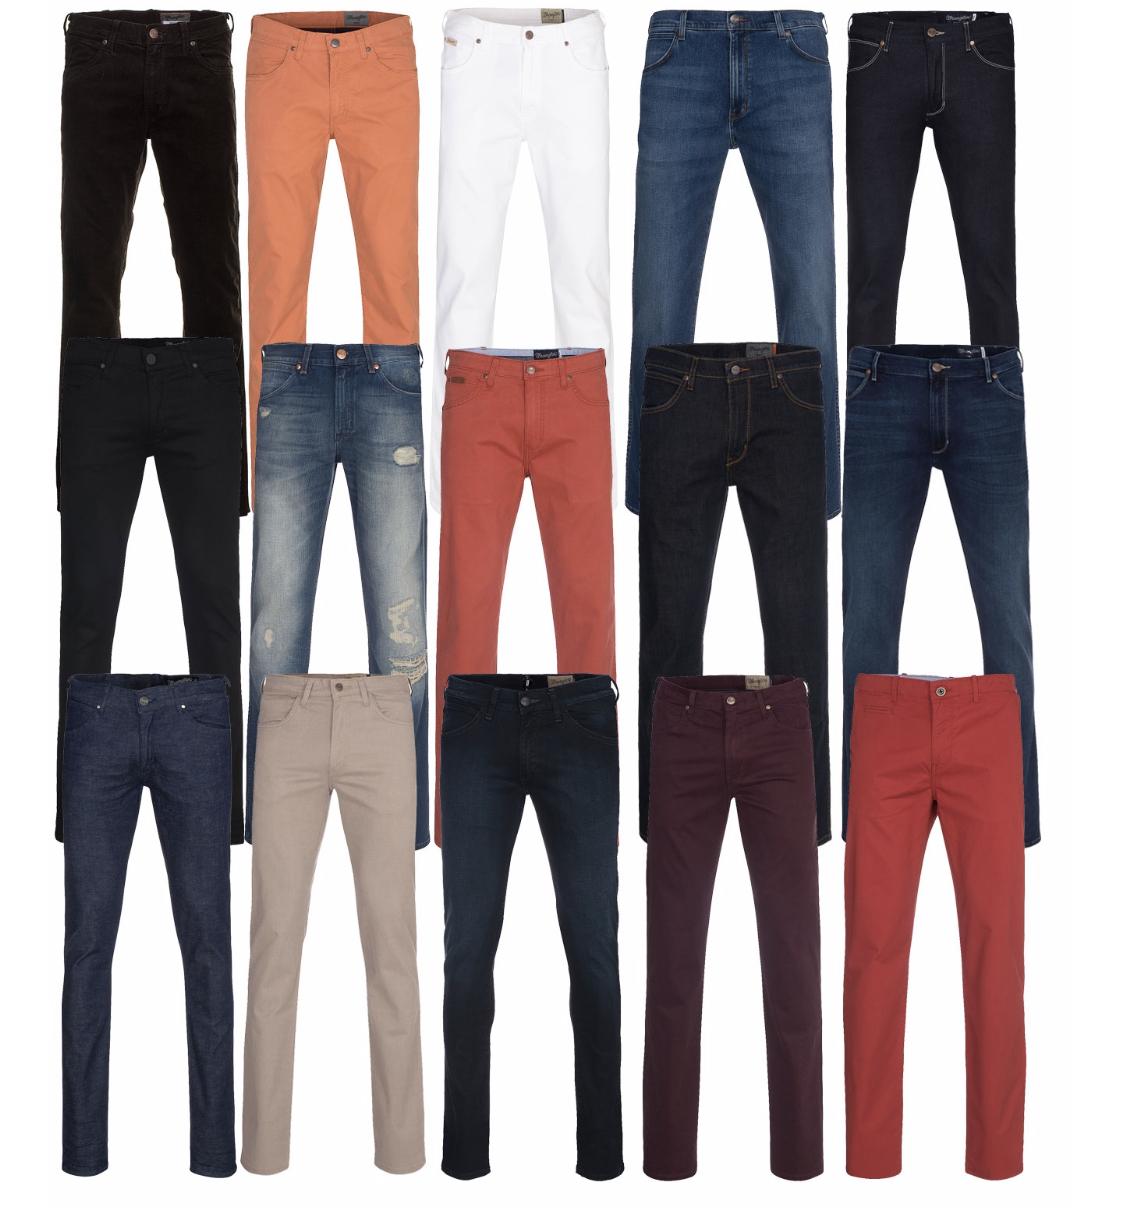 6x Wrangler Jeans & Chino Restgröße nur 29,94€ inkl. Versand! (1x 4,99€ exkl. VSK)